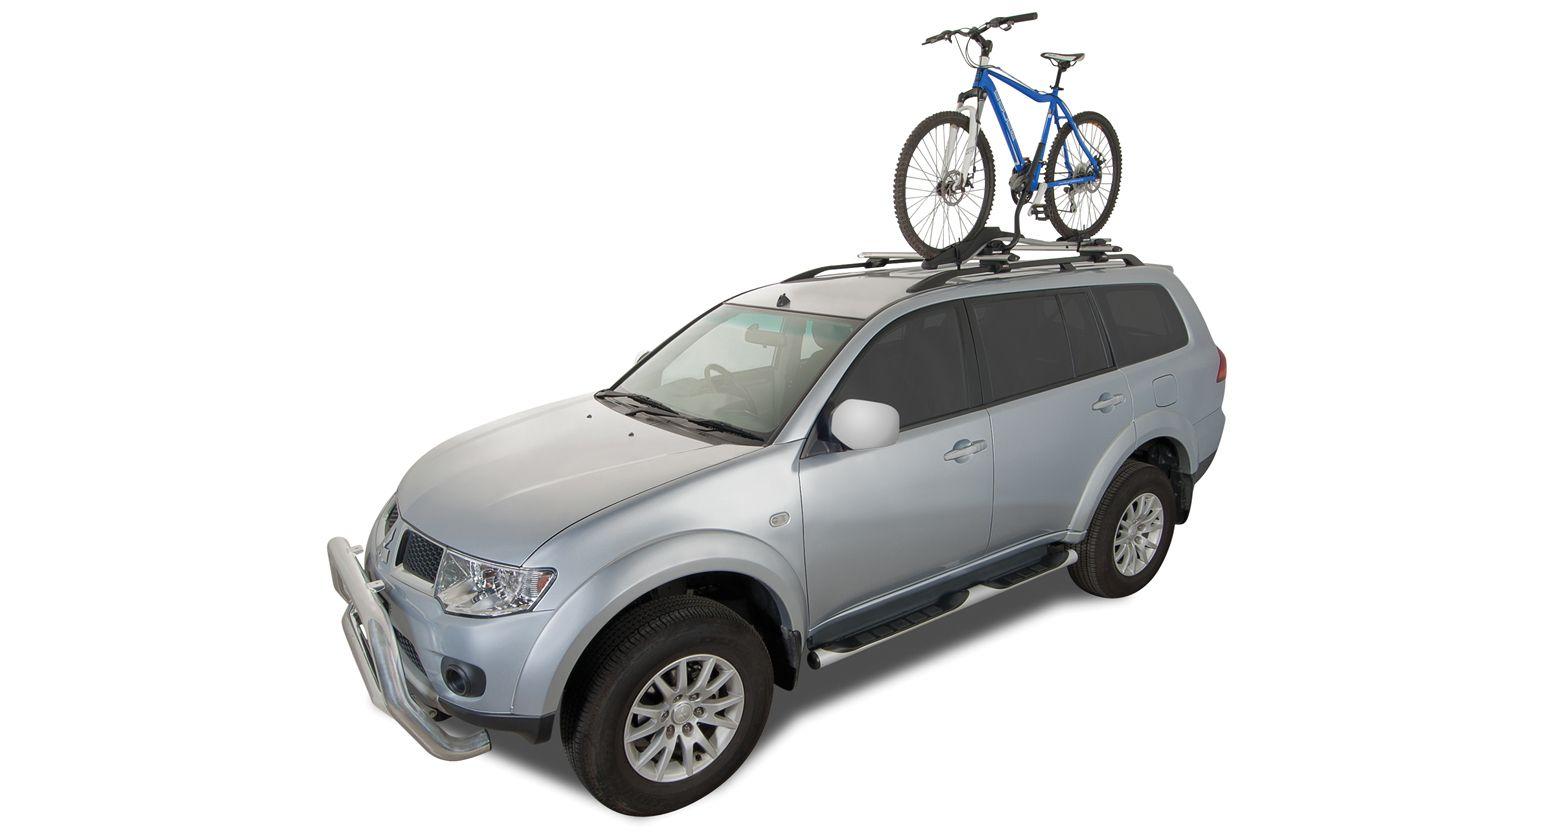 Discovery Bike Carrier (Left) - #RBC017   Rhino-Rack